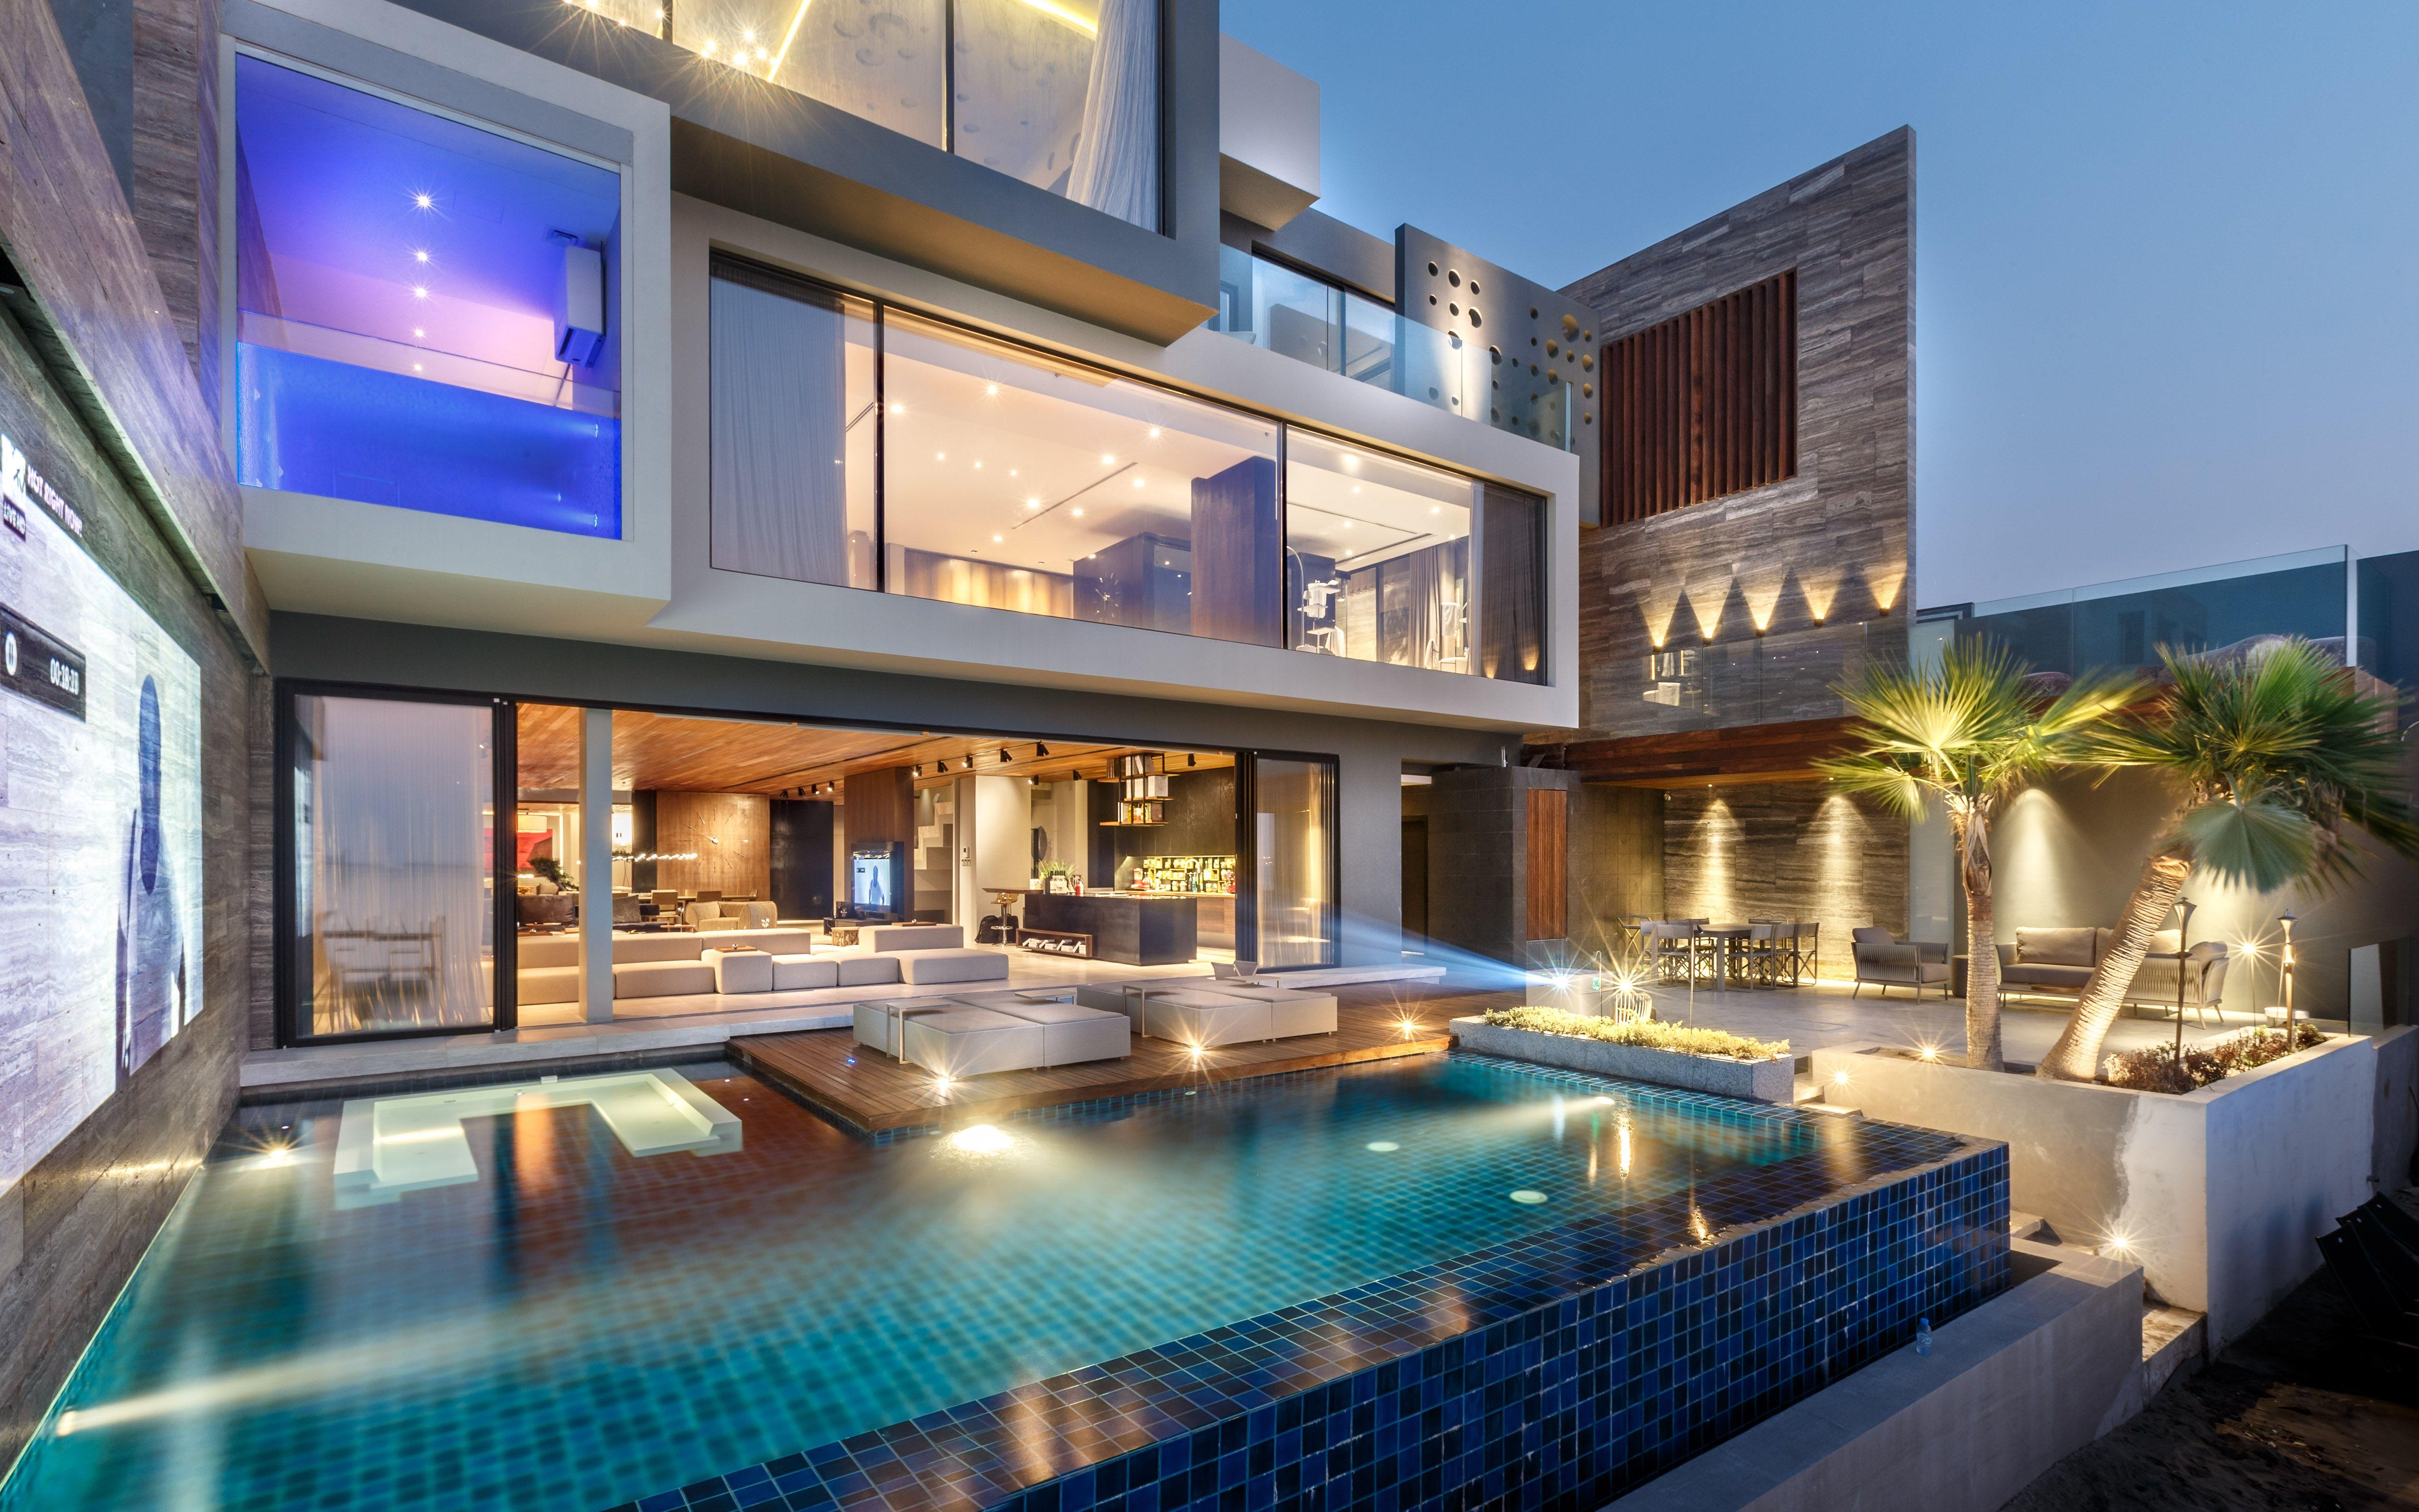 Aak villa by moriq 2015 2016 image riyaz quraishi amwaj islands bahrain